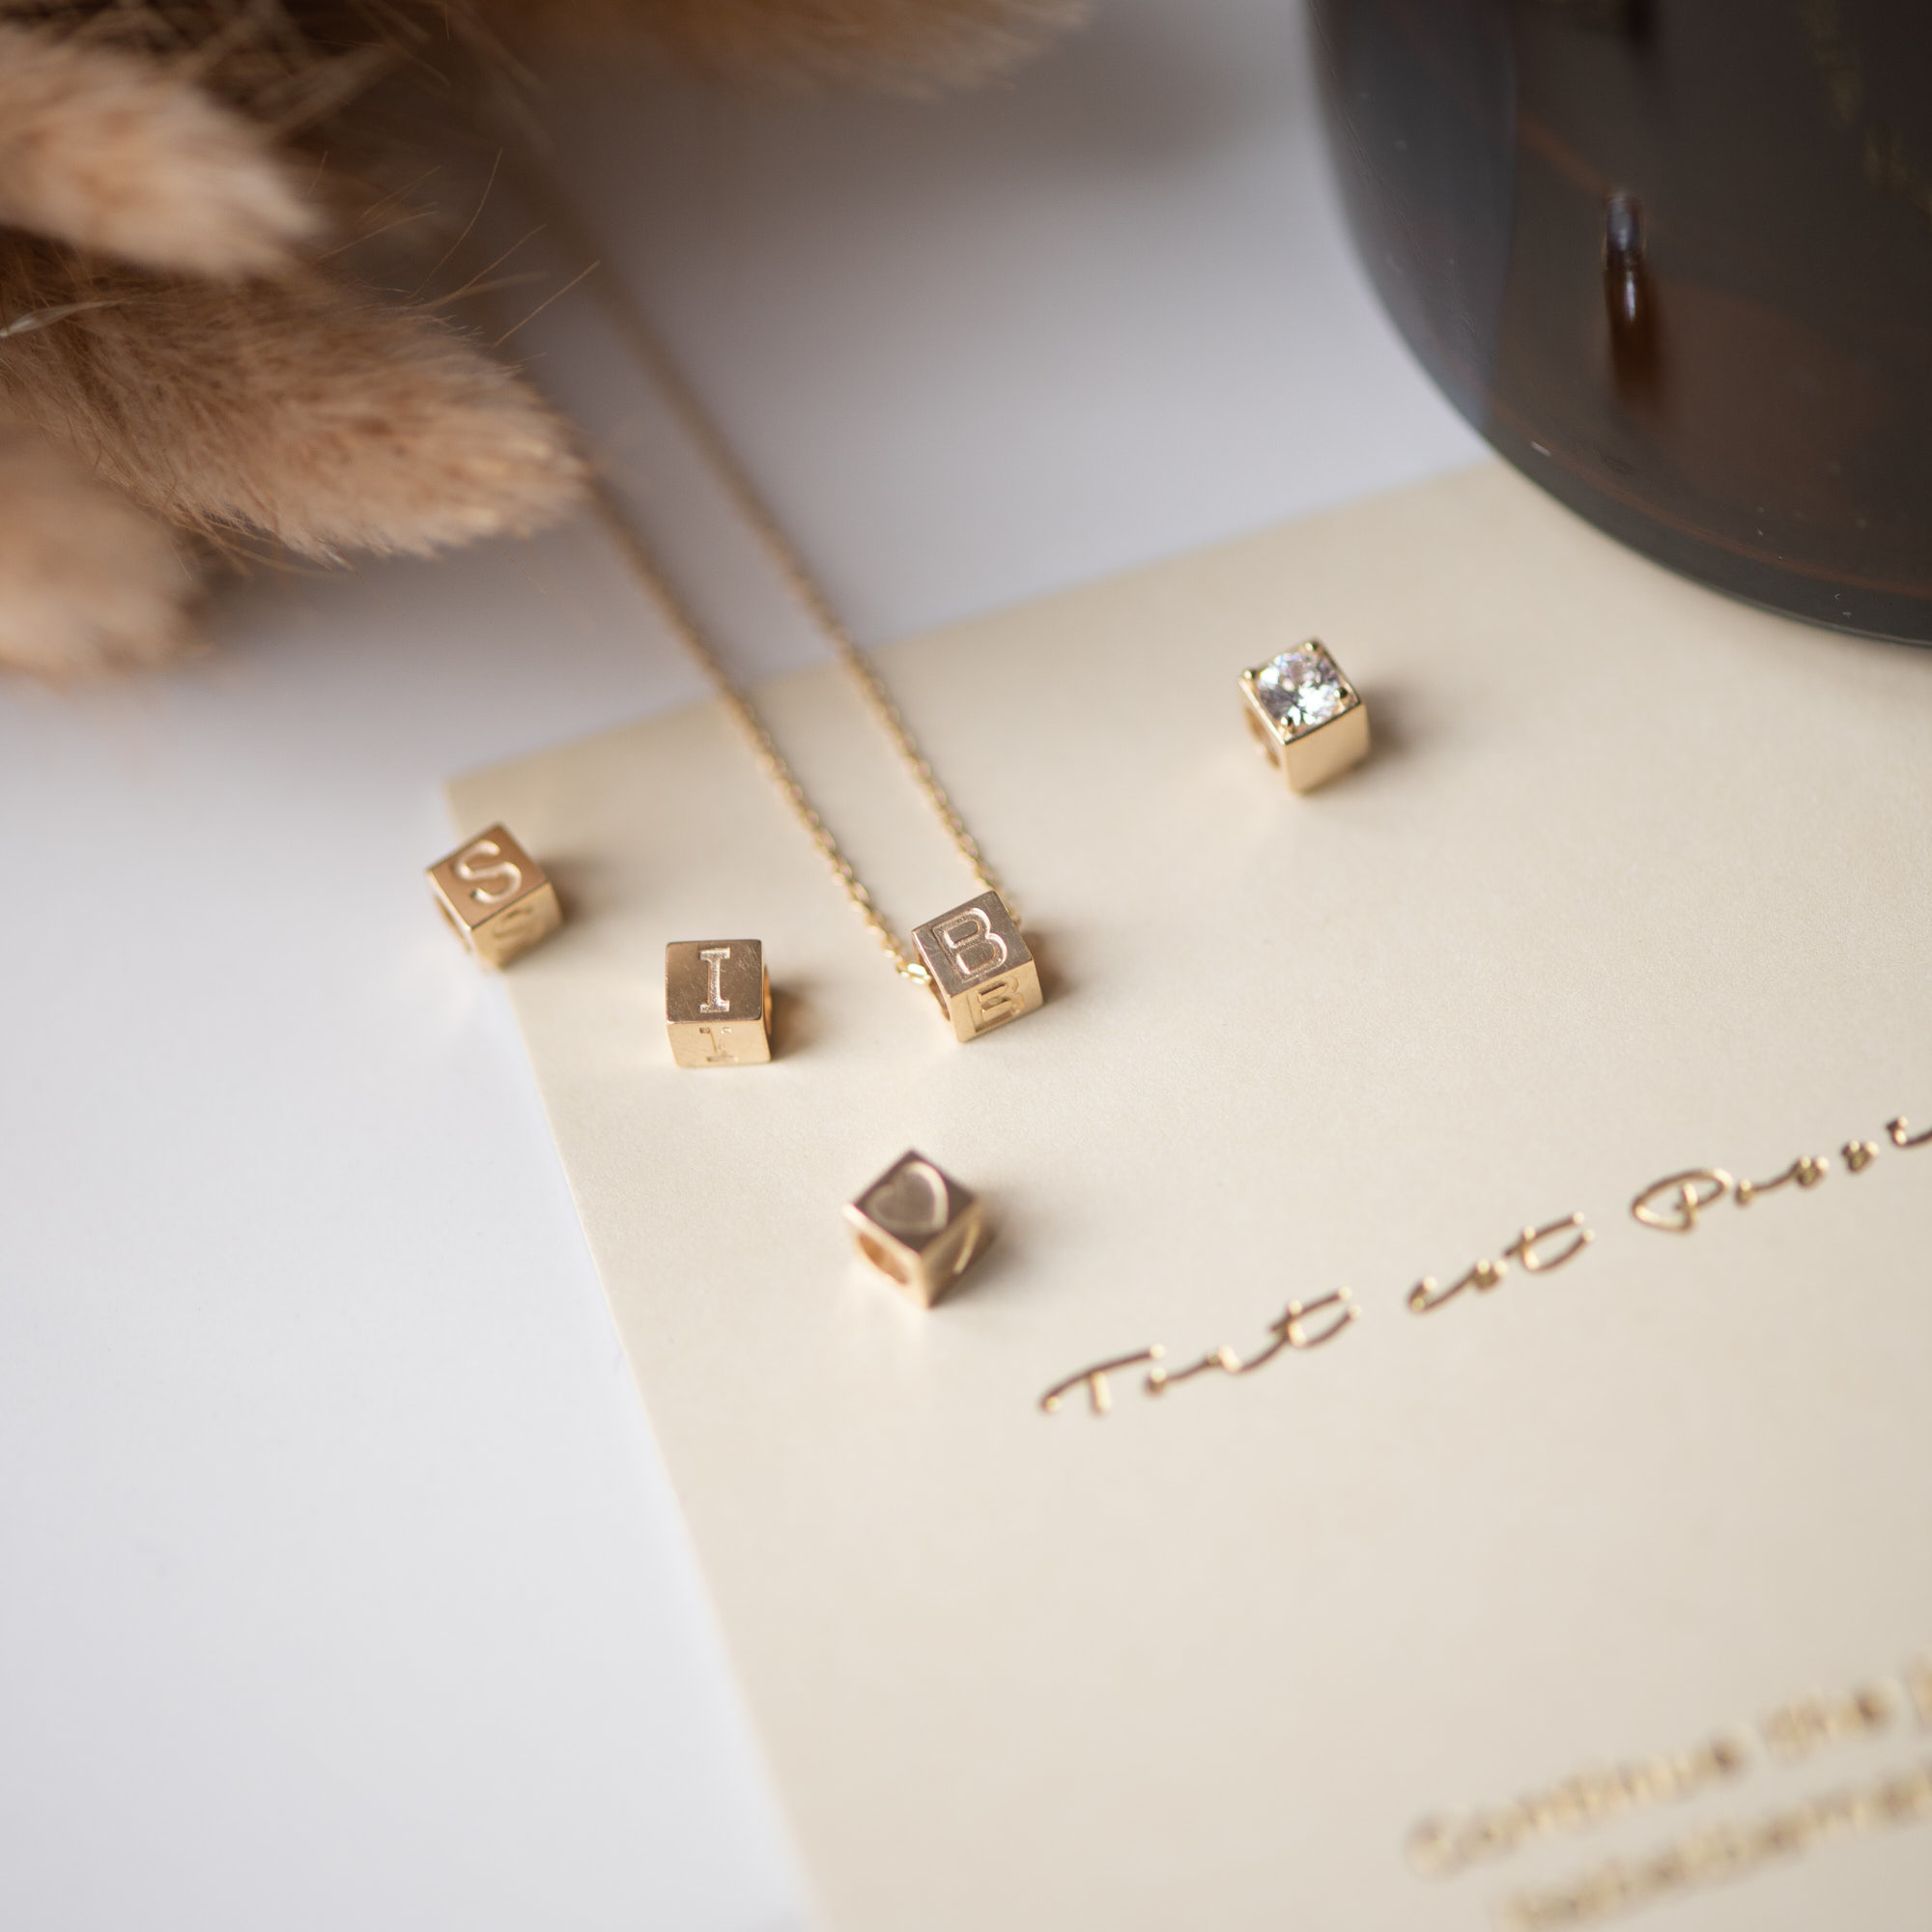 Isabel Bernard Le Carré Felie 14 karat gold cube charm with heart